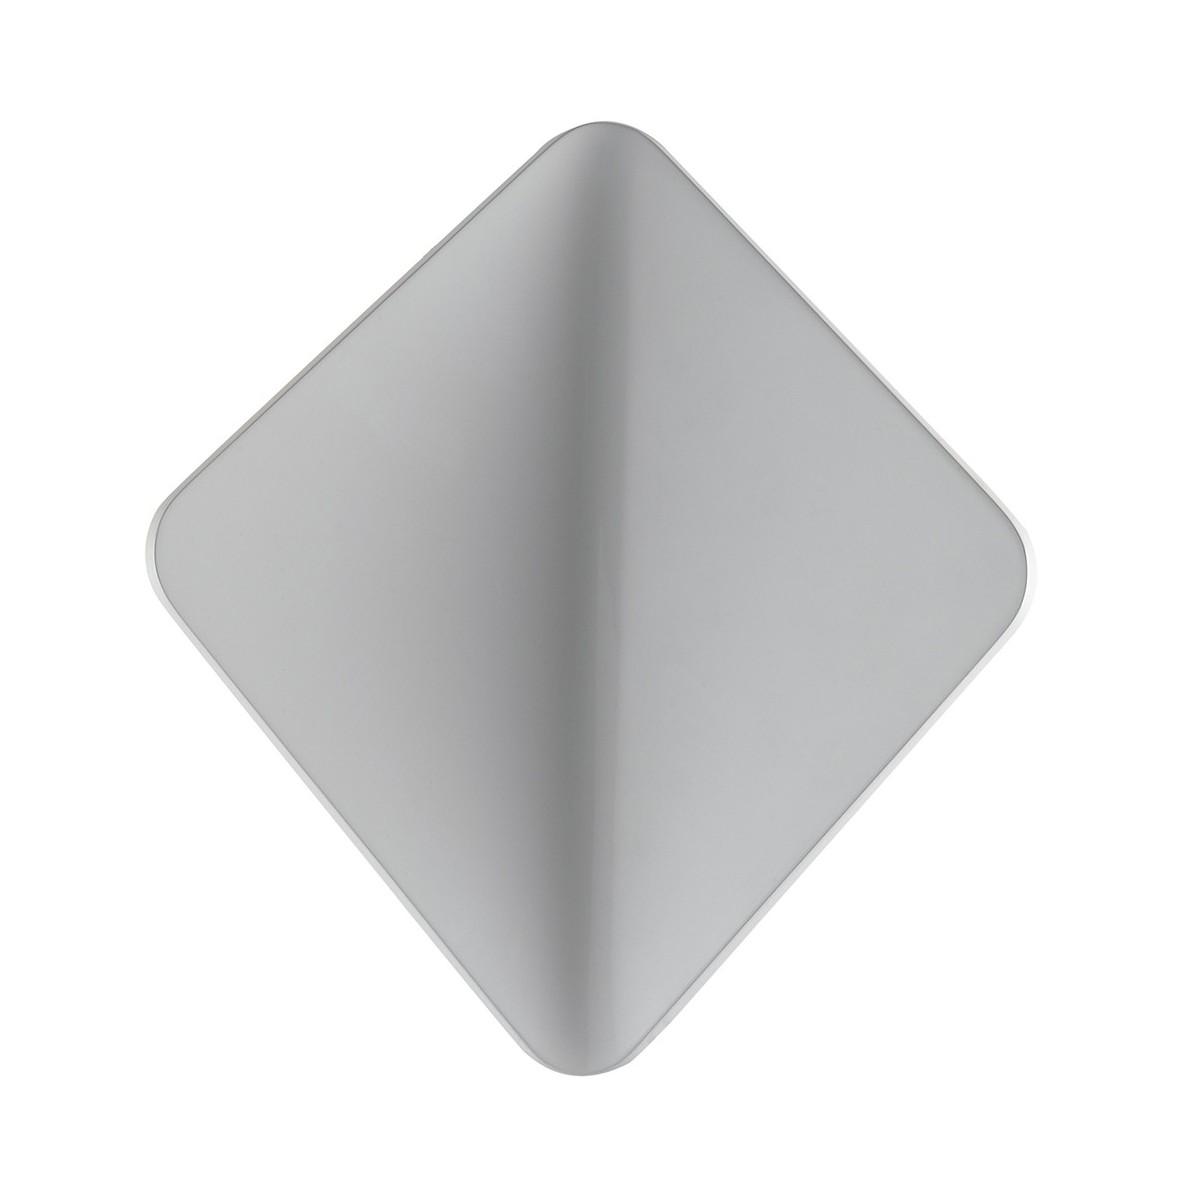 Applique Bianco Led A 4000kelvin 3 watt